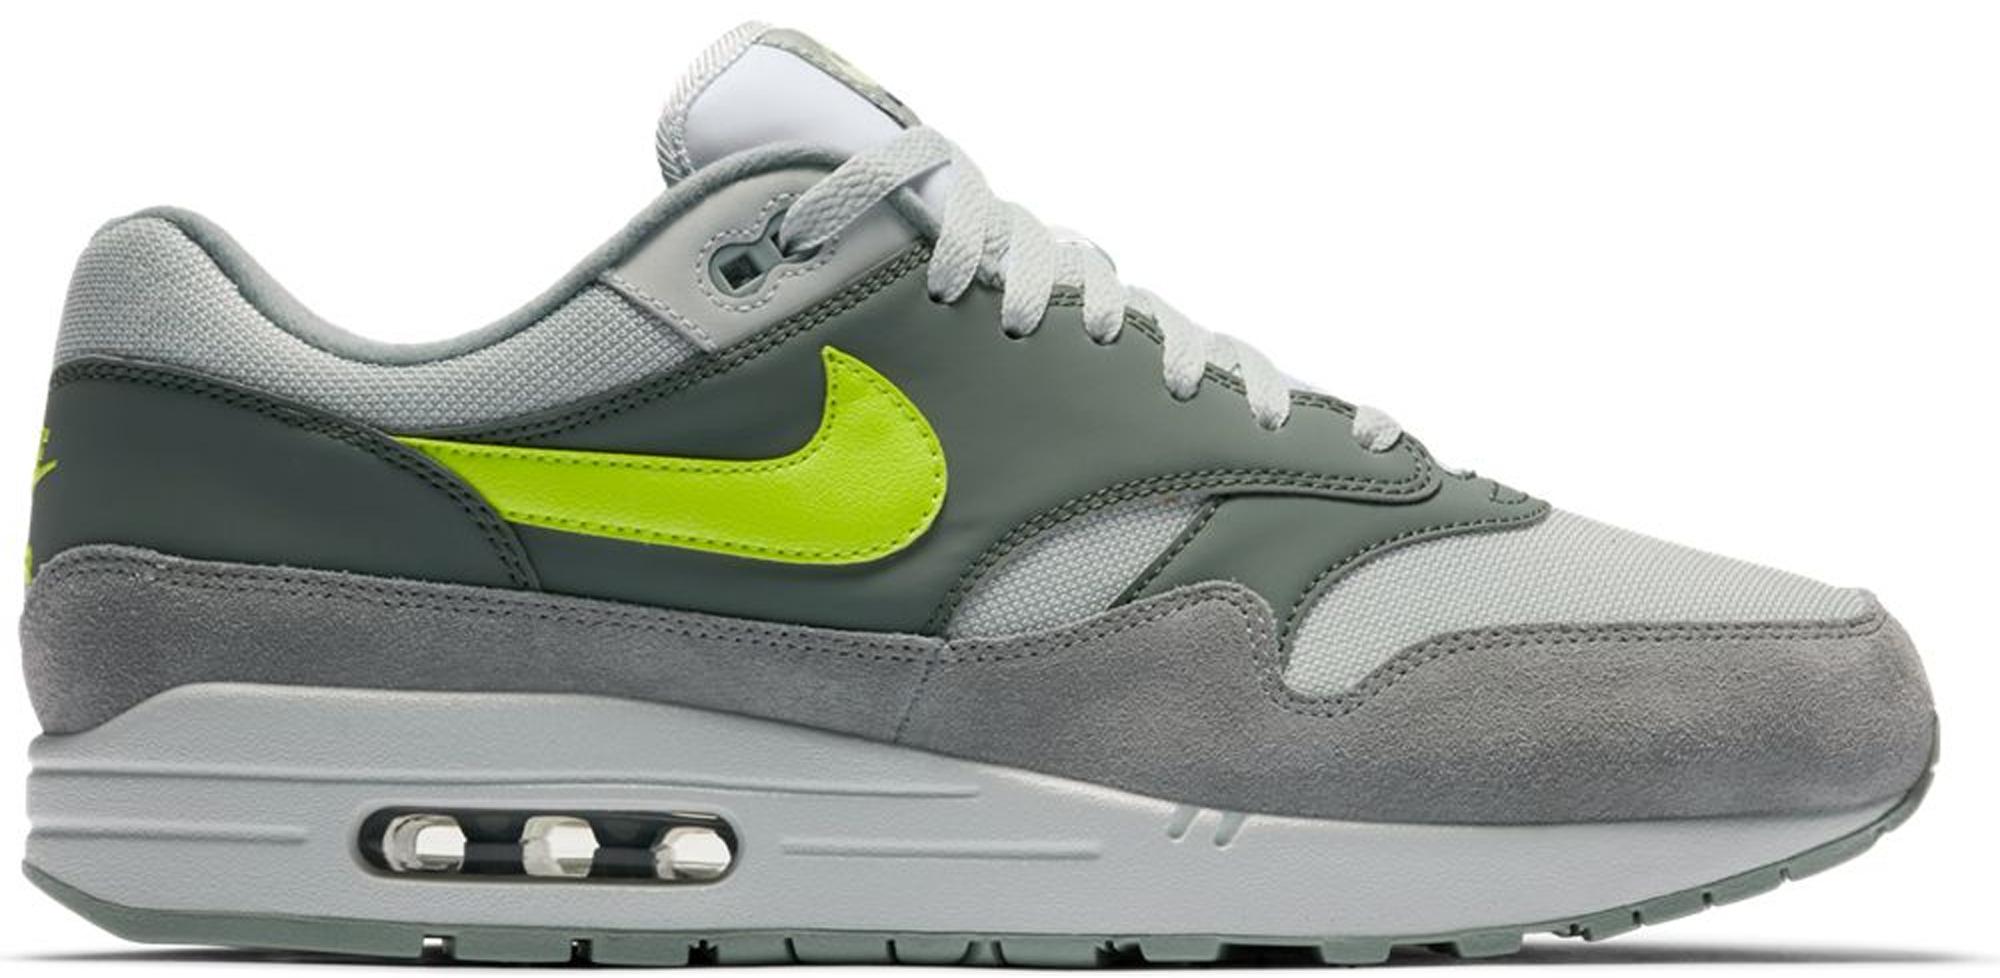 Nike Air Max 1 Mica Green Volt - AH8145-300